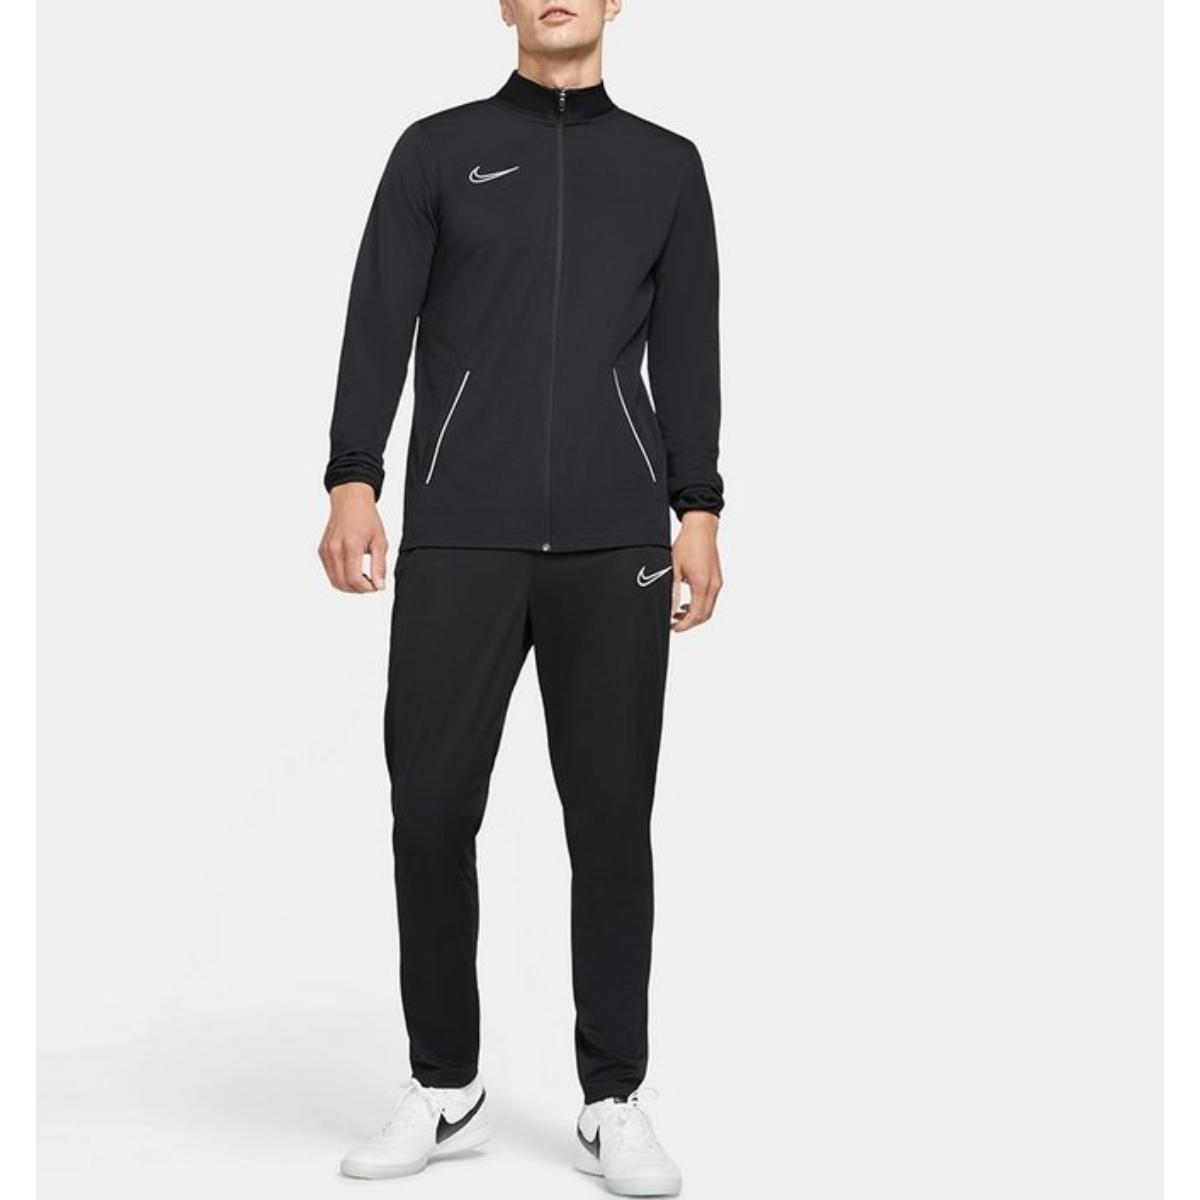 Abrigo Masculino Nike Cw6131-010 Dry Acd21 Trk  Suit Preto